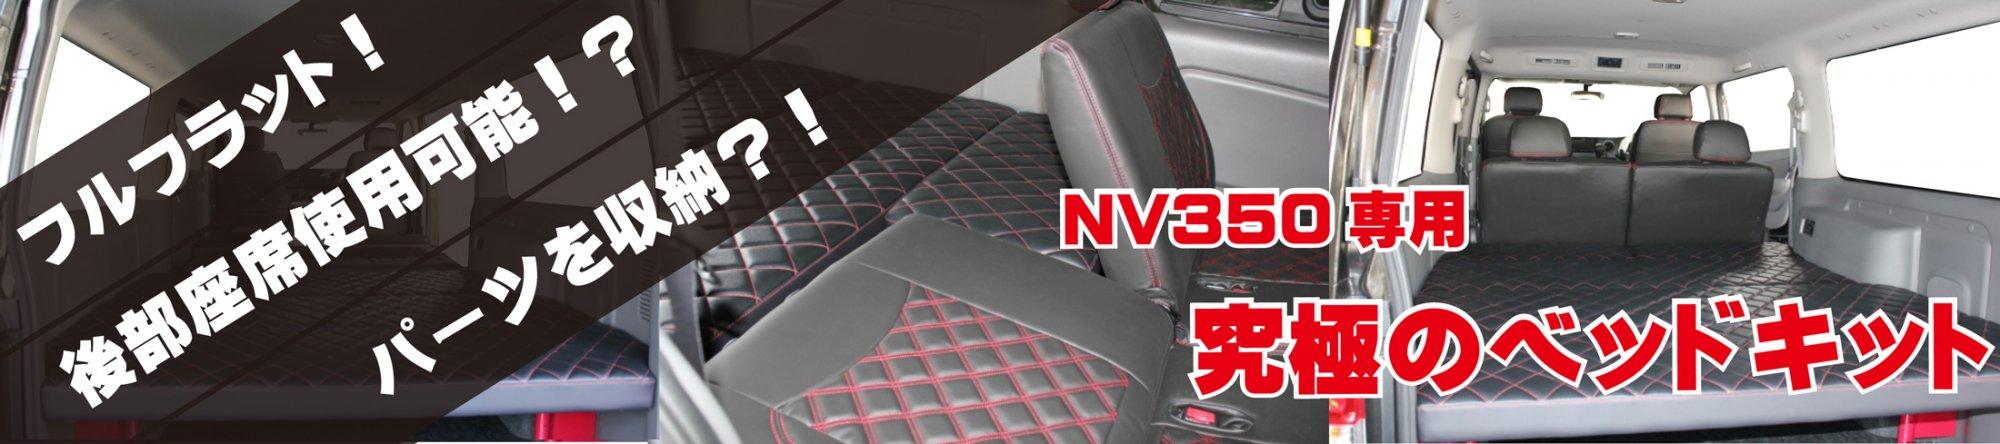 2013/06/30 00:00:00 NV350専用 ベッドキット登場!その説明です!